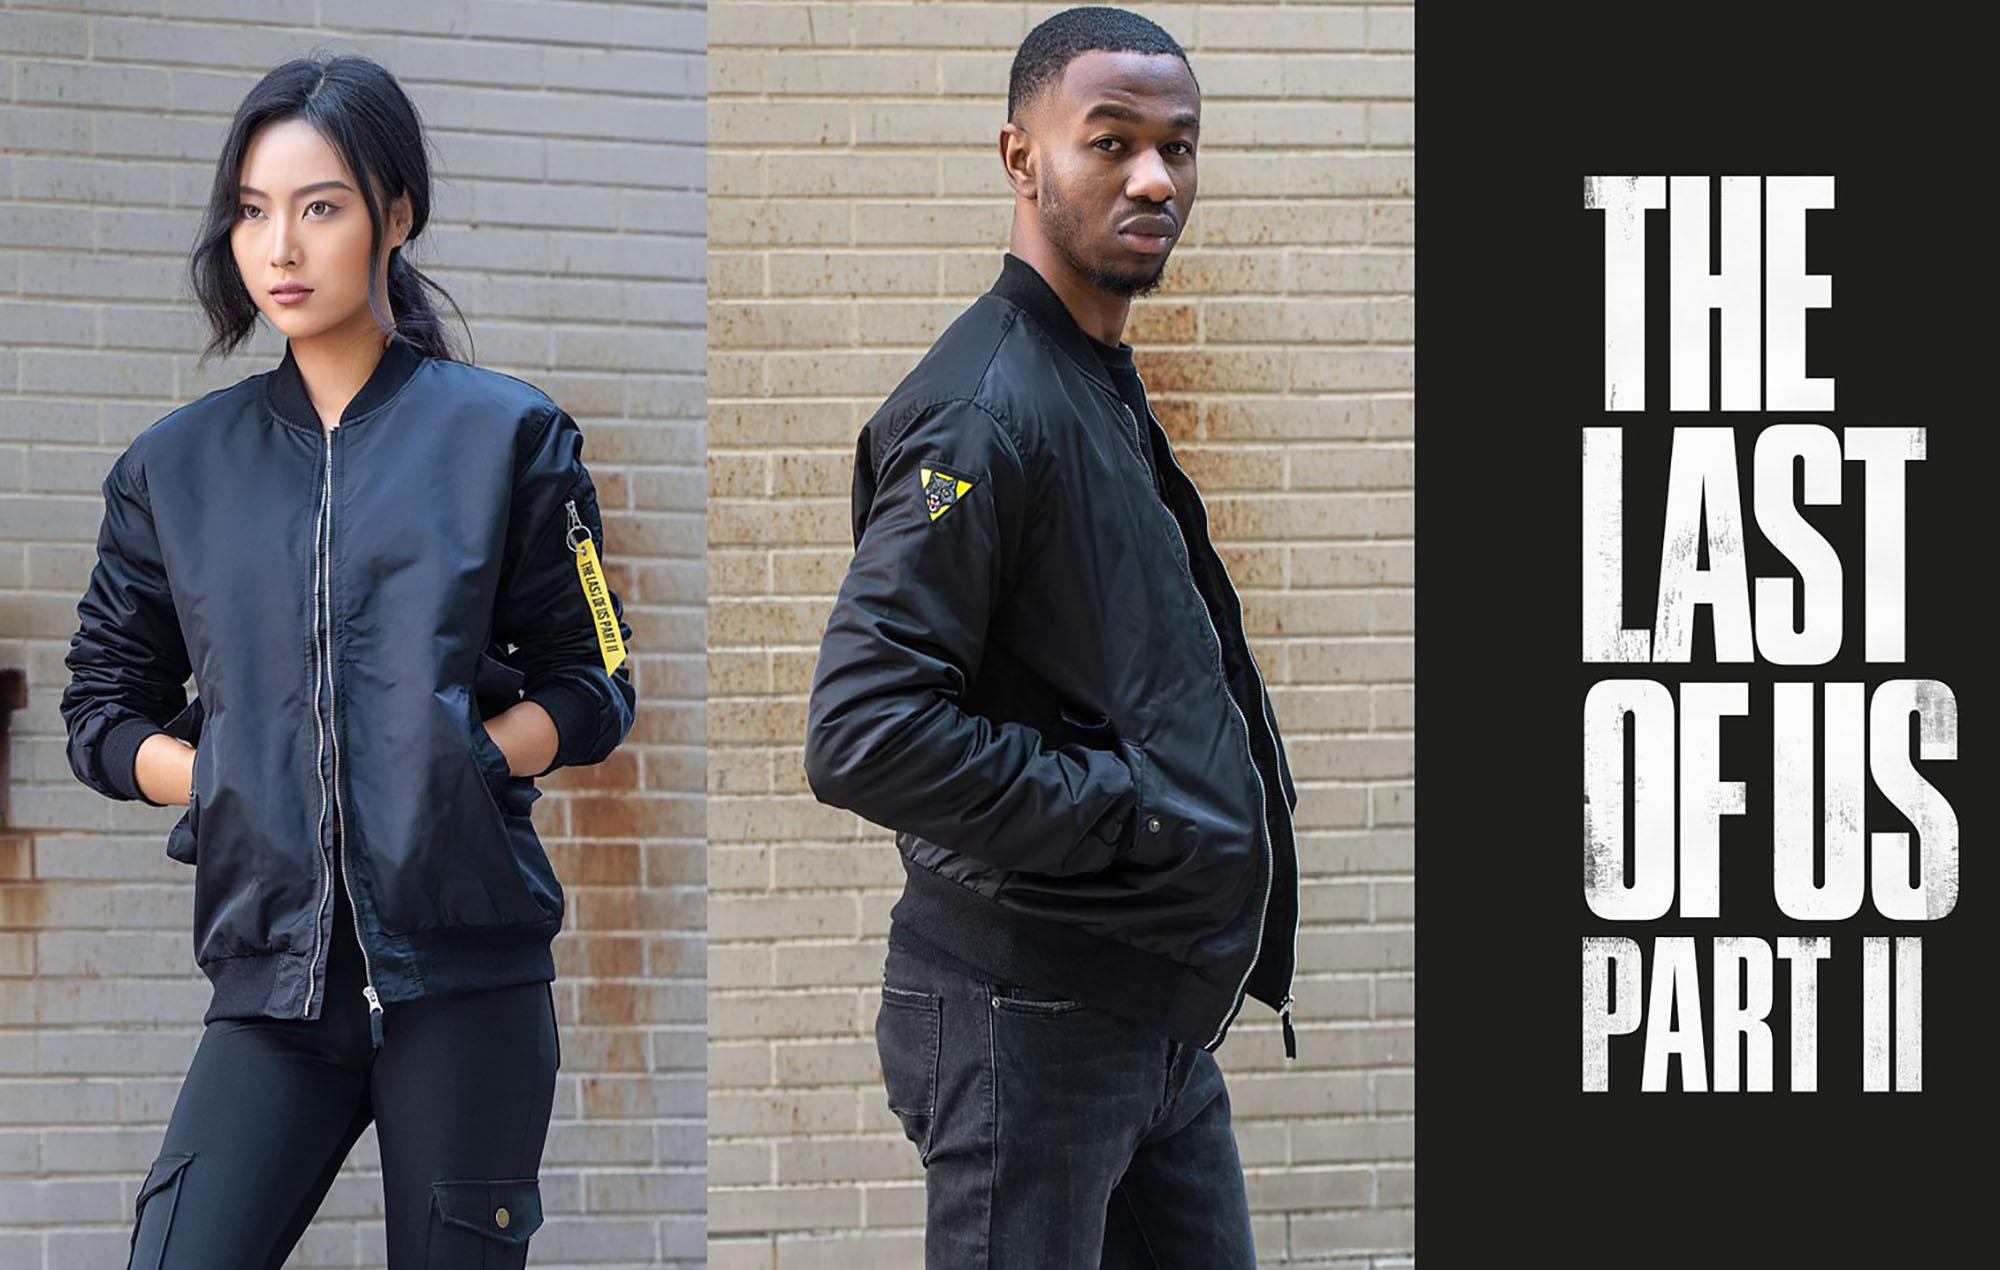 The Last Of Us bomber jacket. Image credit: Naughty Dog Studios